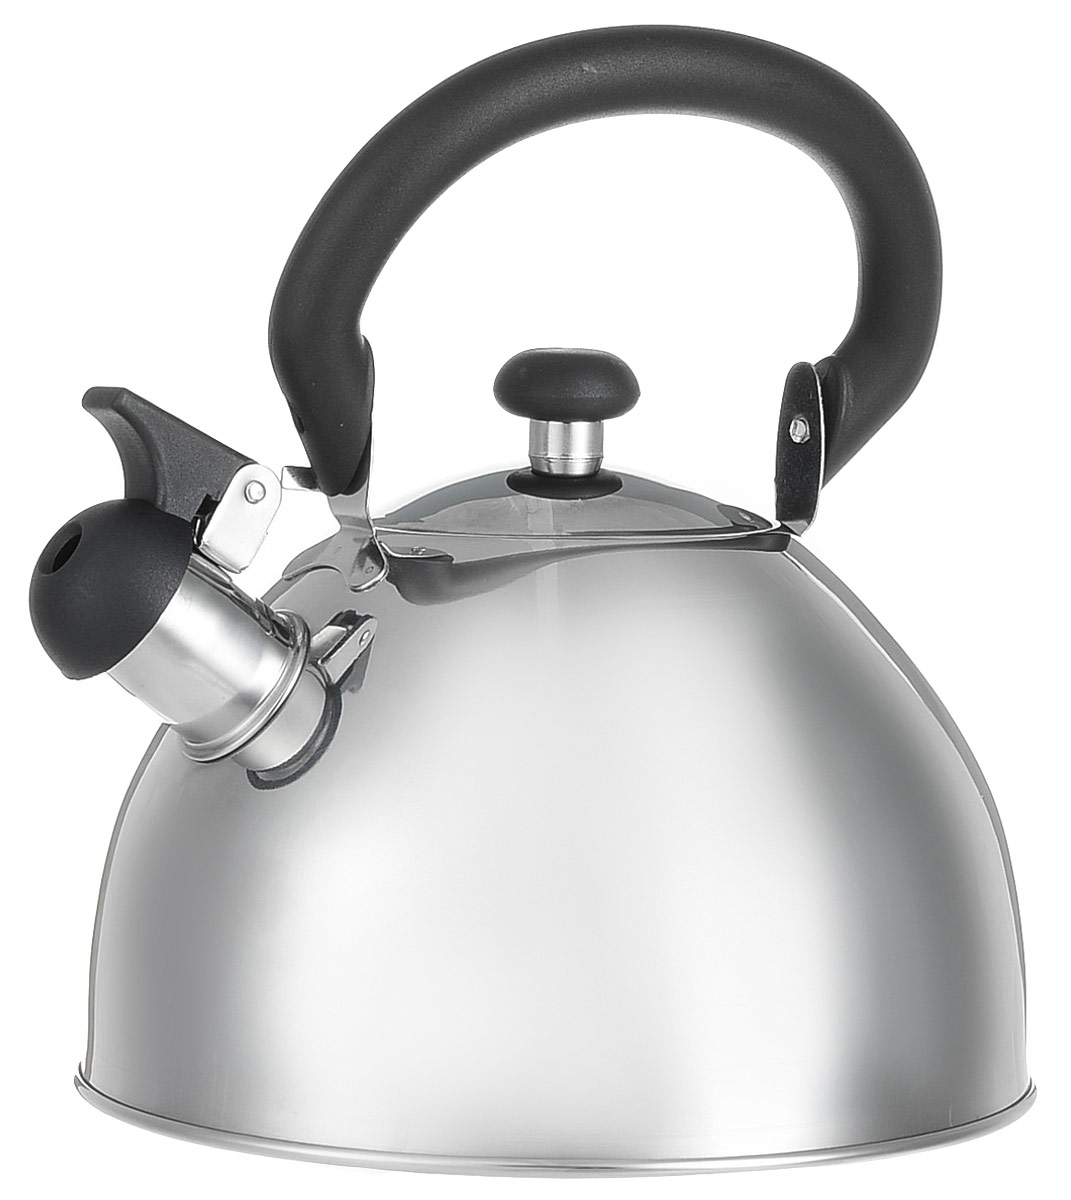 Чайник Appetite со свистком, 2,5 л. HSK-H049